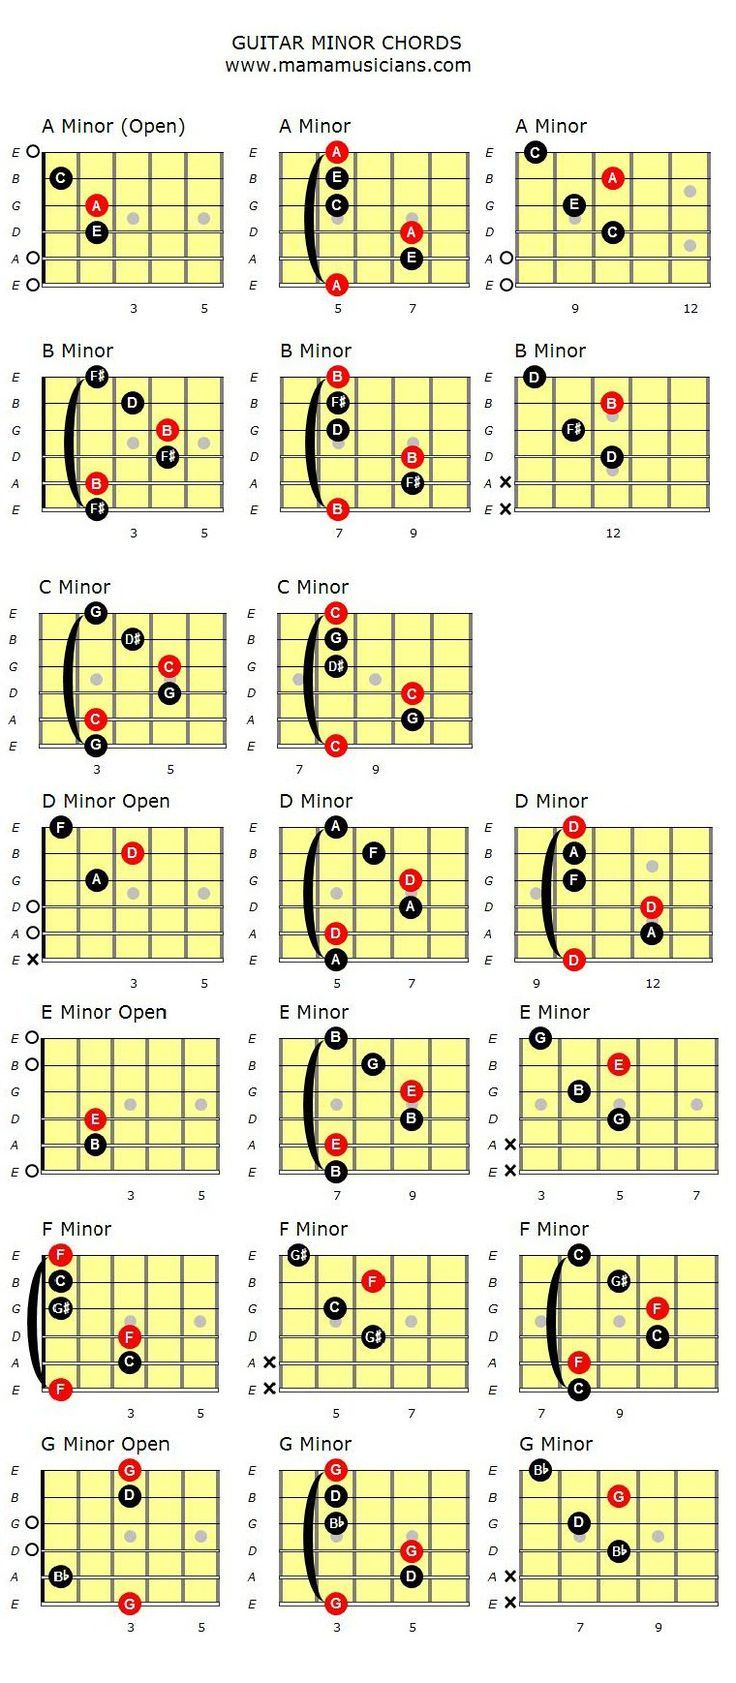 10 Easy Pop Songs to Learn on Guitar - Fender Guitars